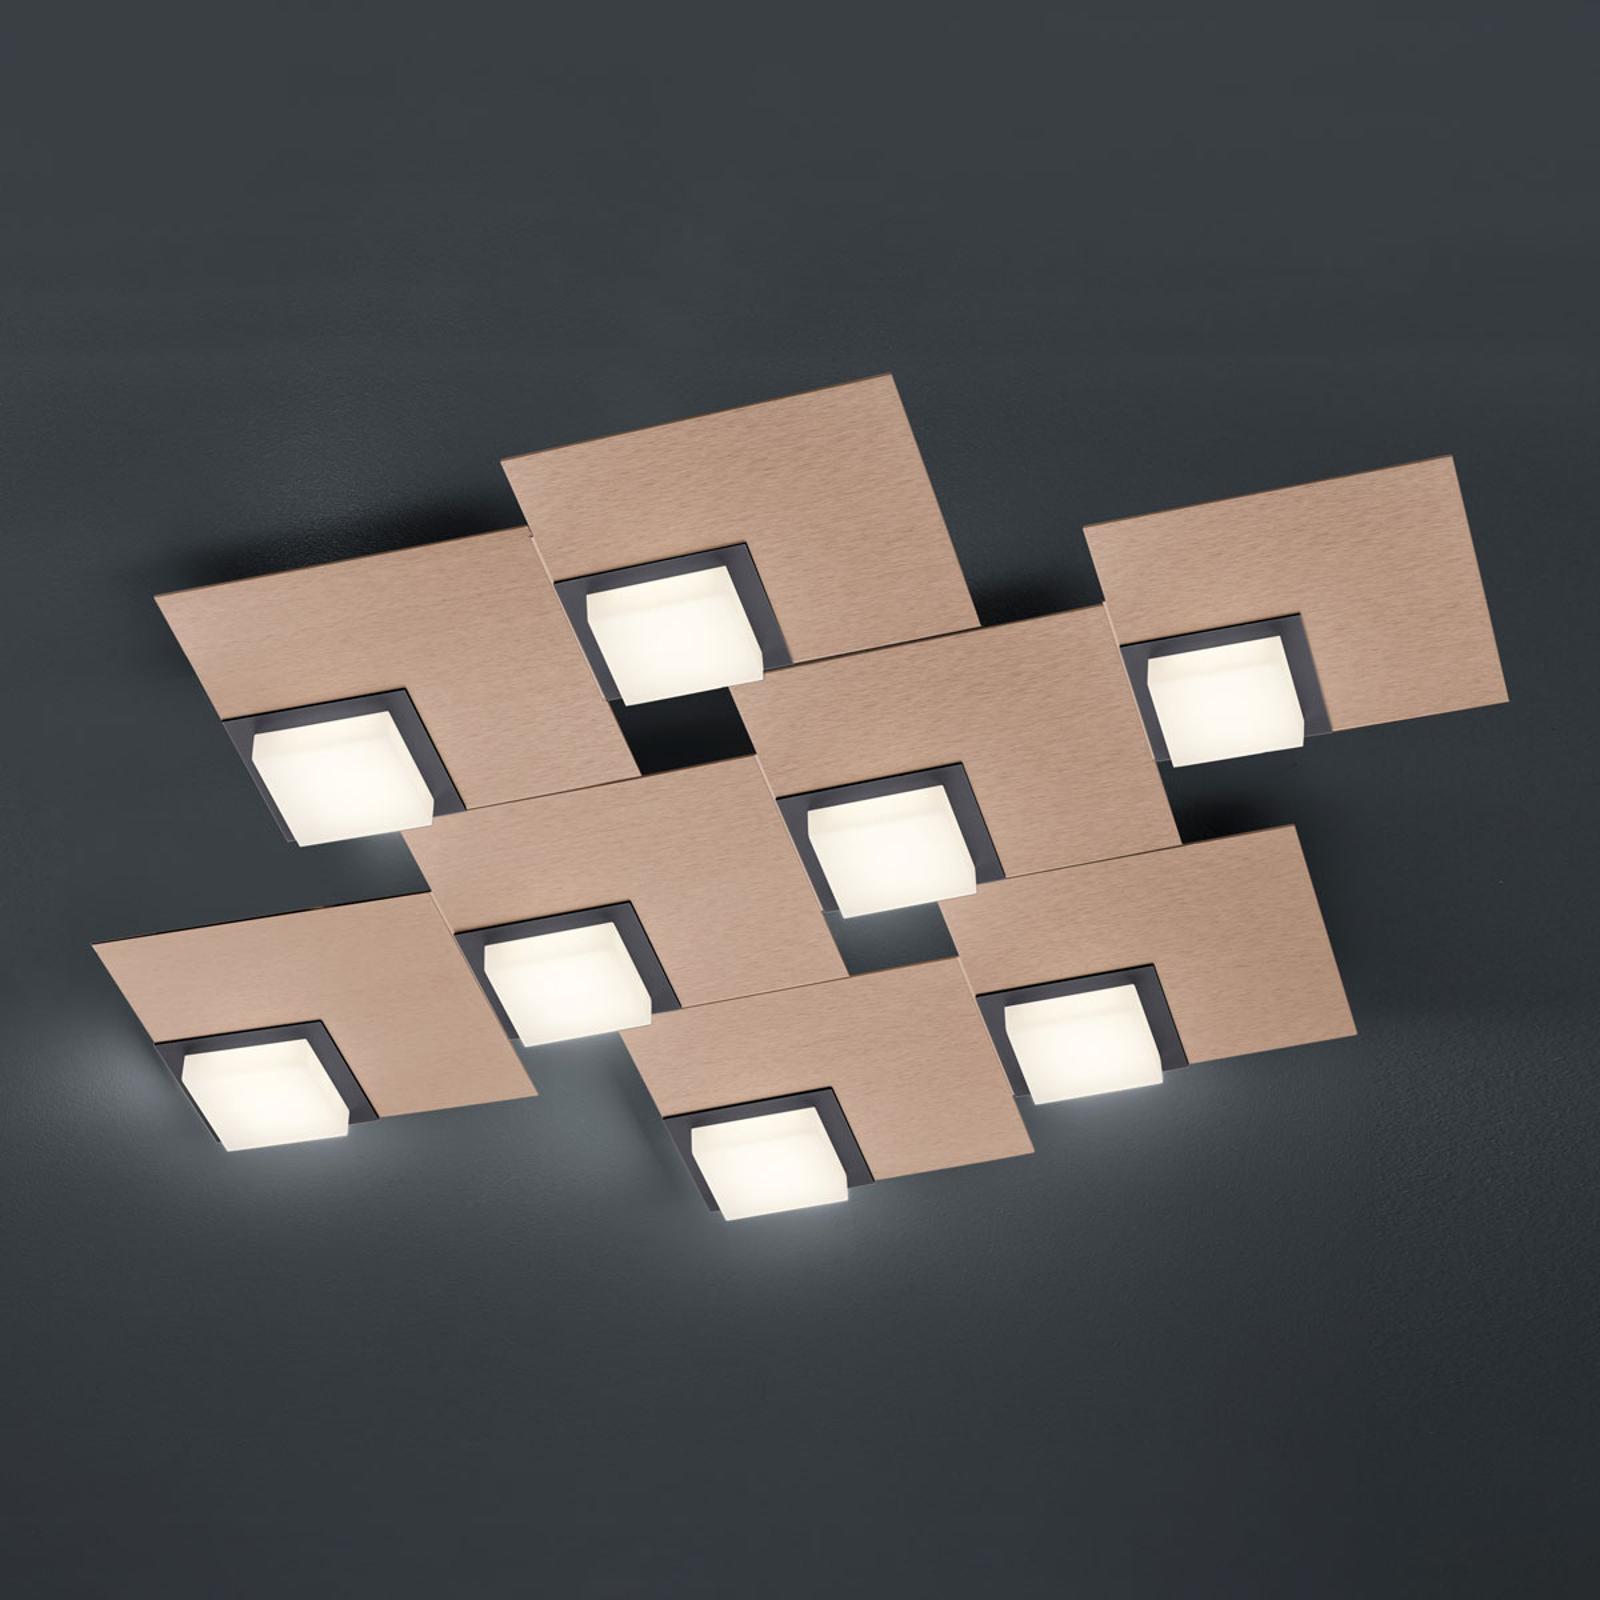 BANKAMP Quadro LED-Deckenleuchte 64W, roségold